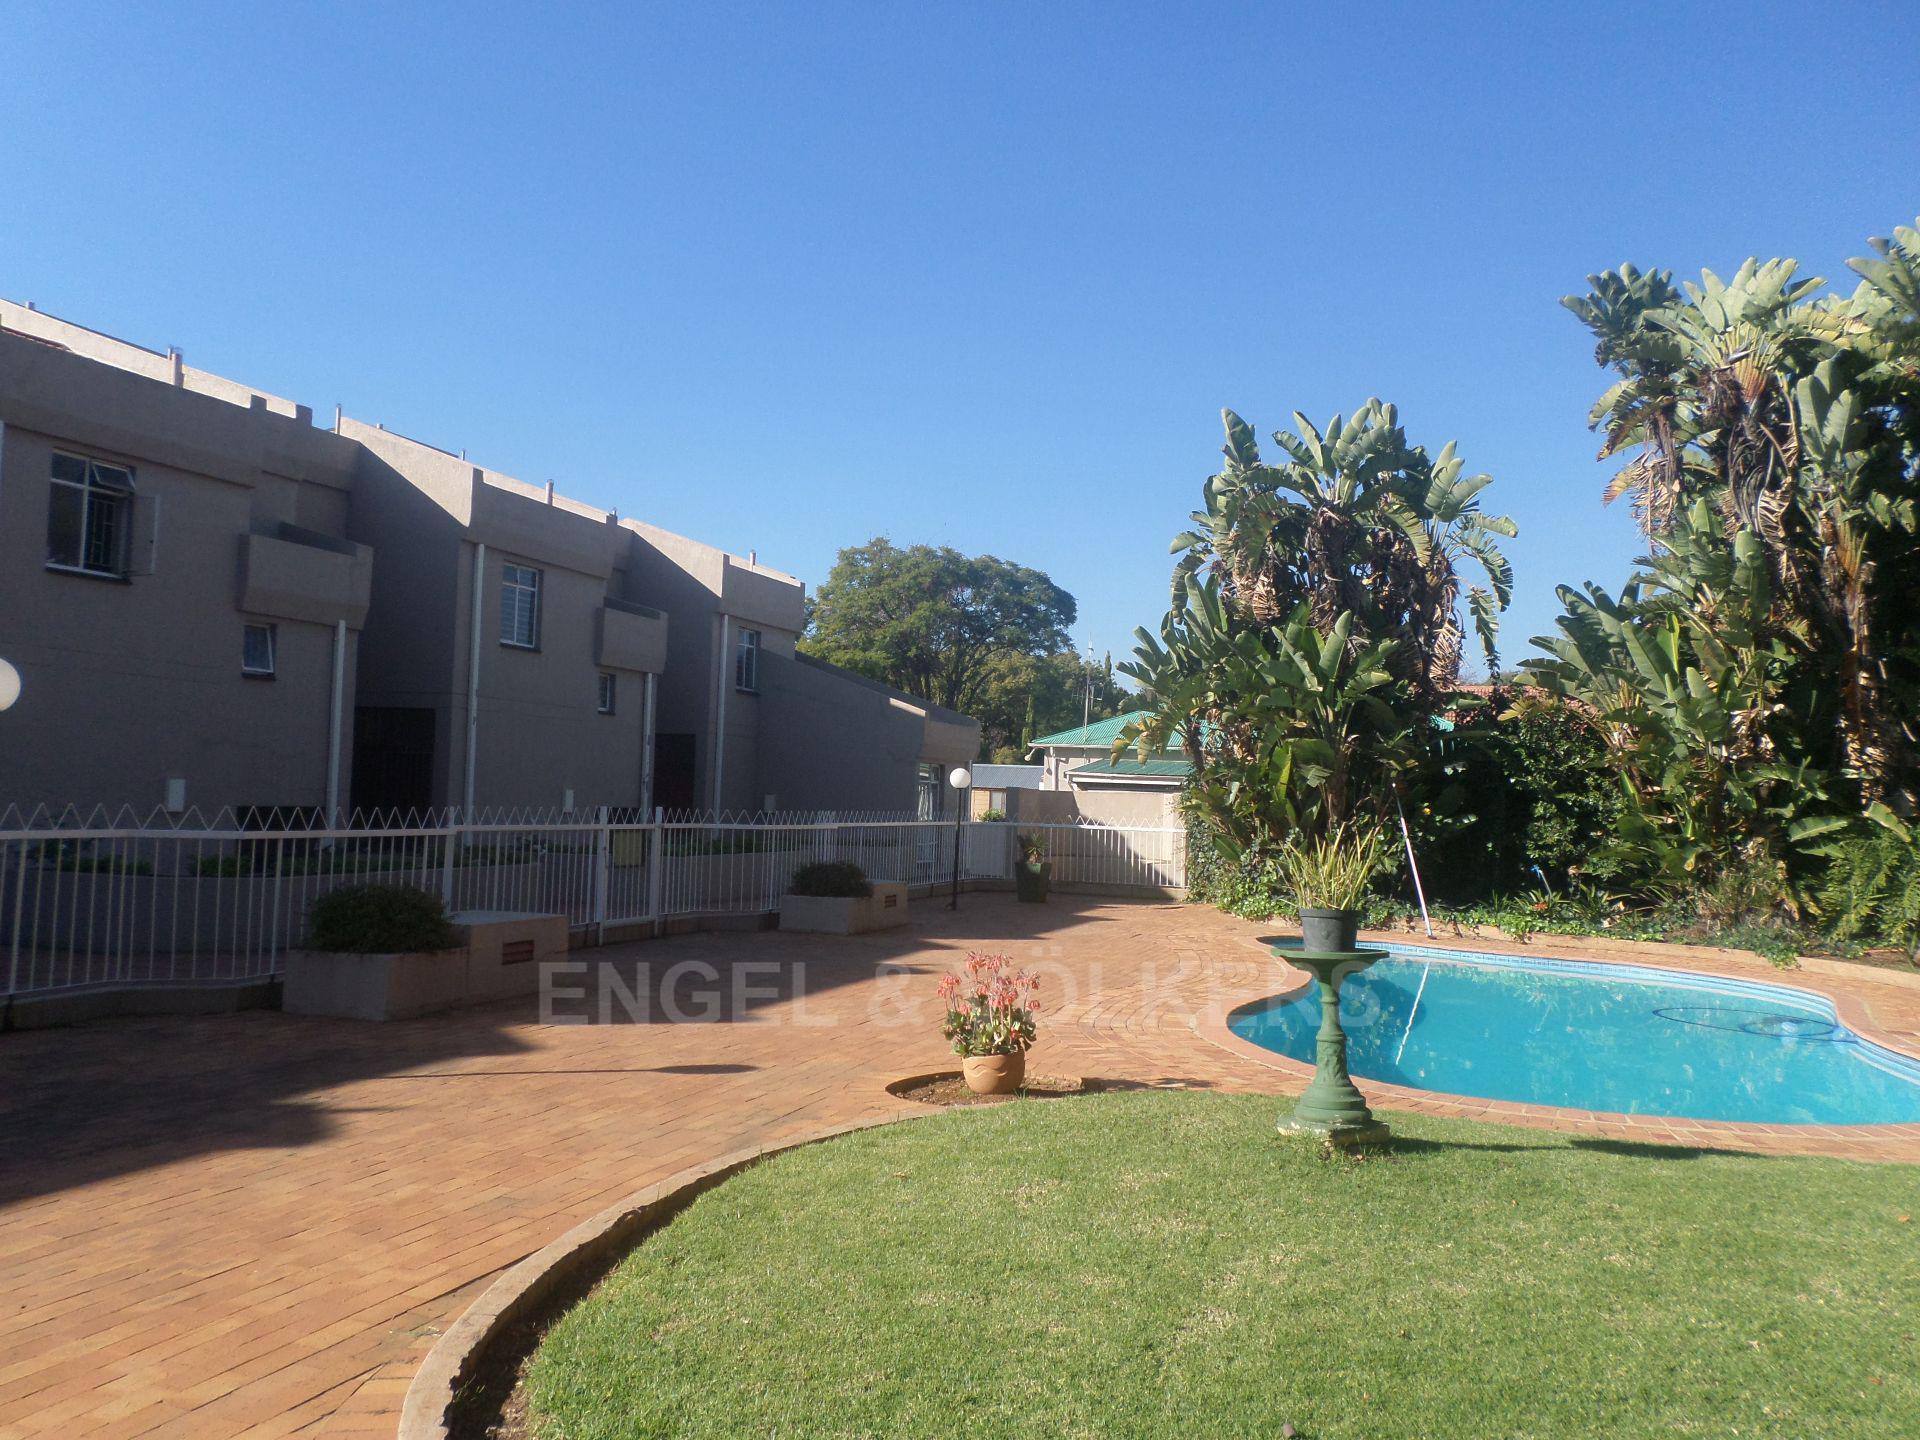 Pretoria, Arcadia Property  | Houses For Sale Arcadia, ARCADIA, Townhouse 4 bedrooms property for sale Price:2,100,000